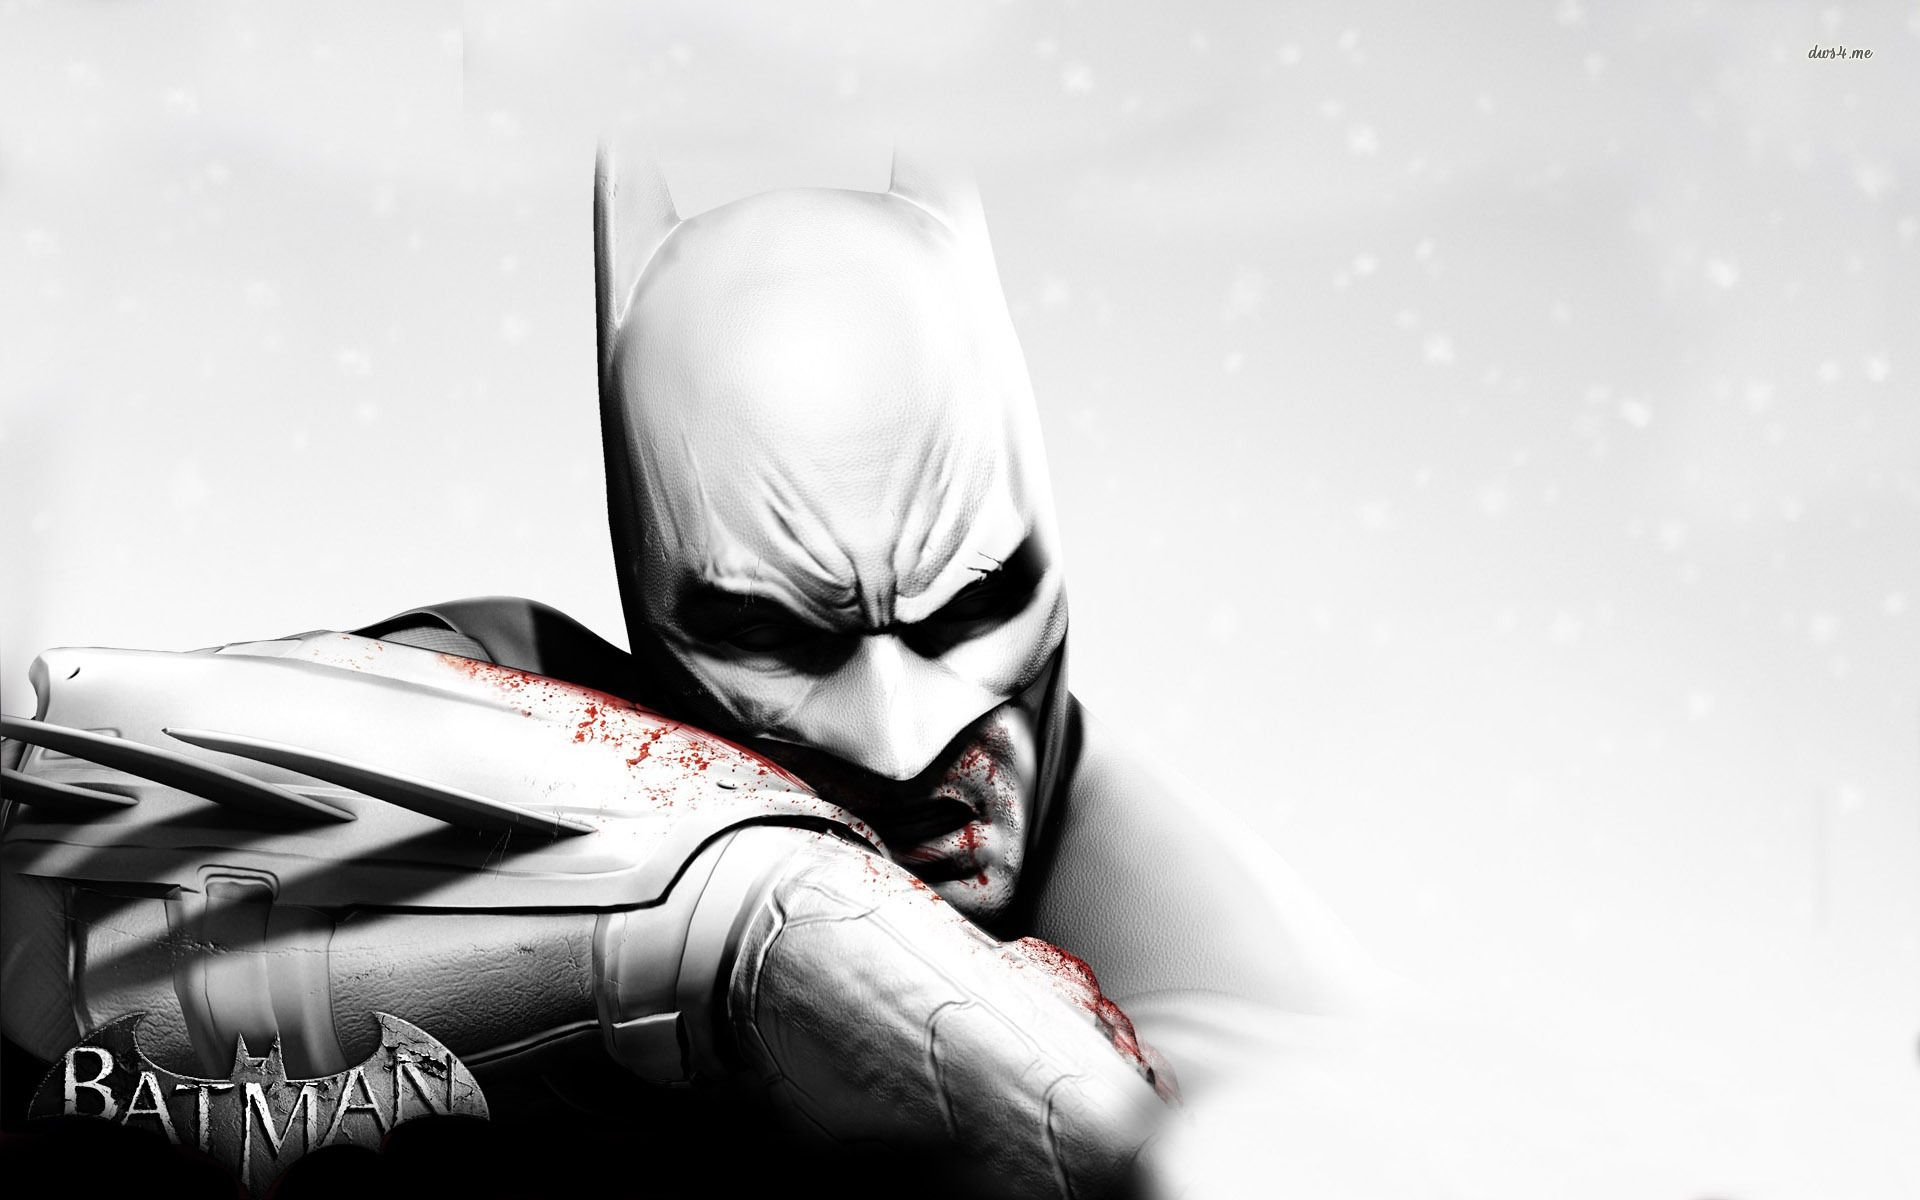 Batman Arkham City Wallpapers Top Free Batman Arkham City